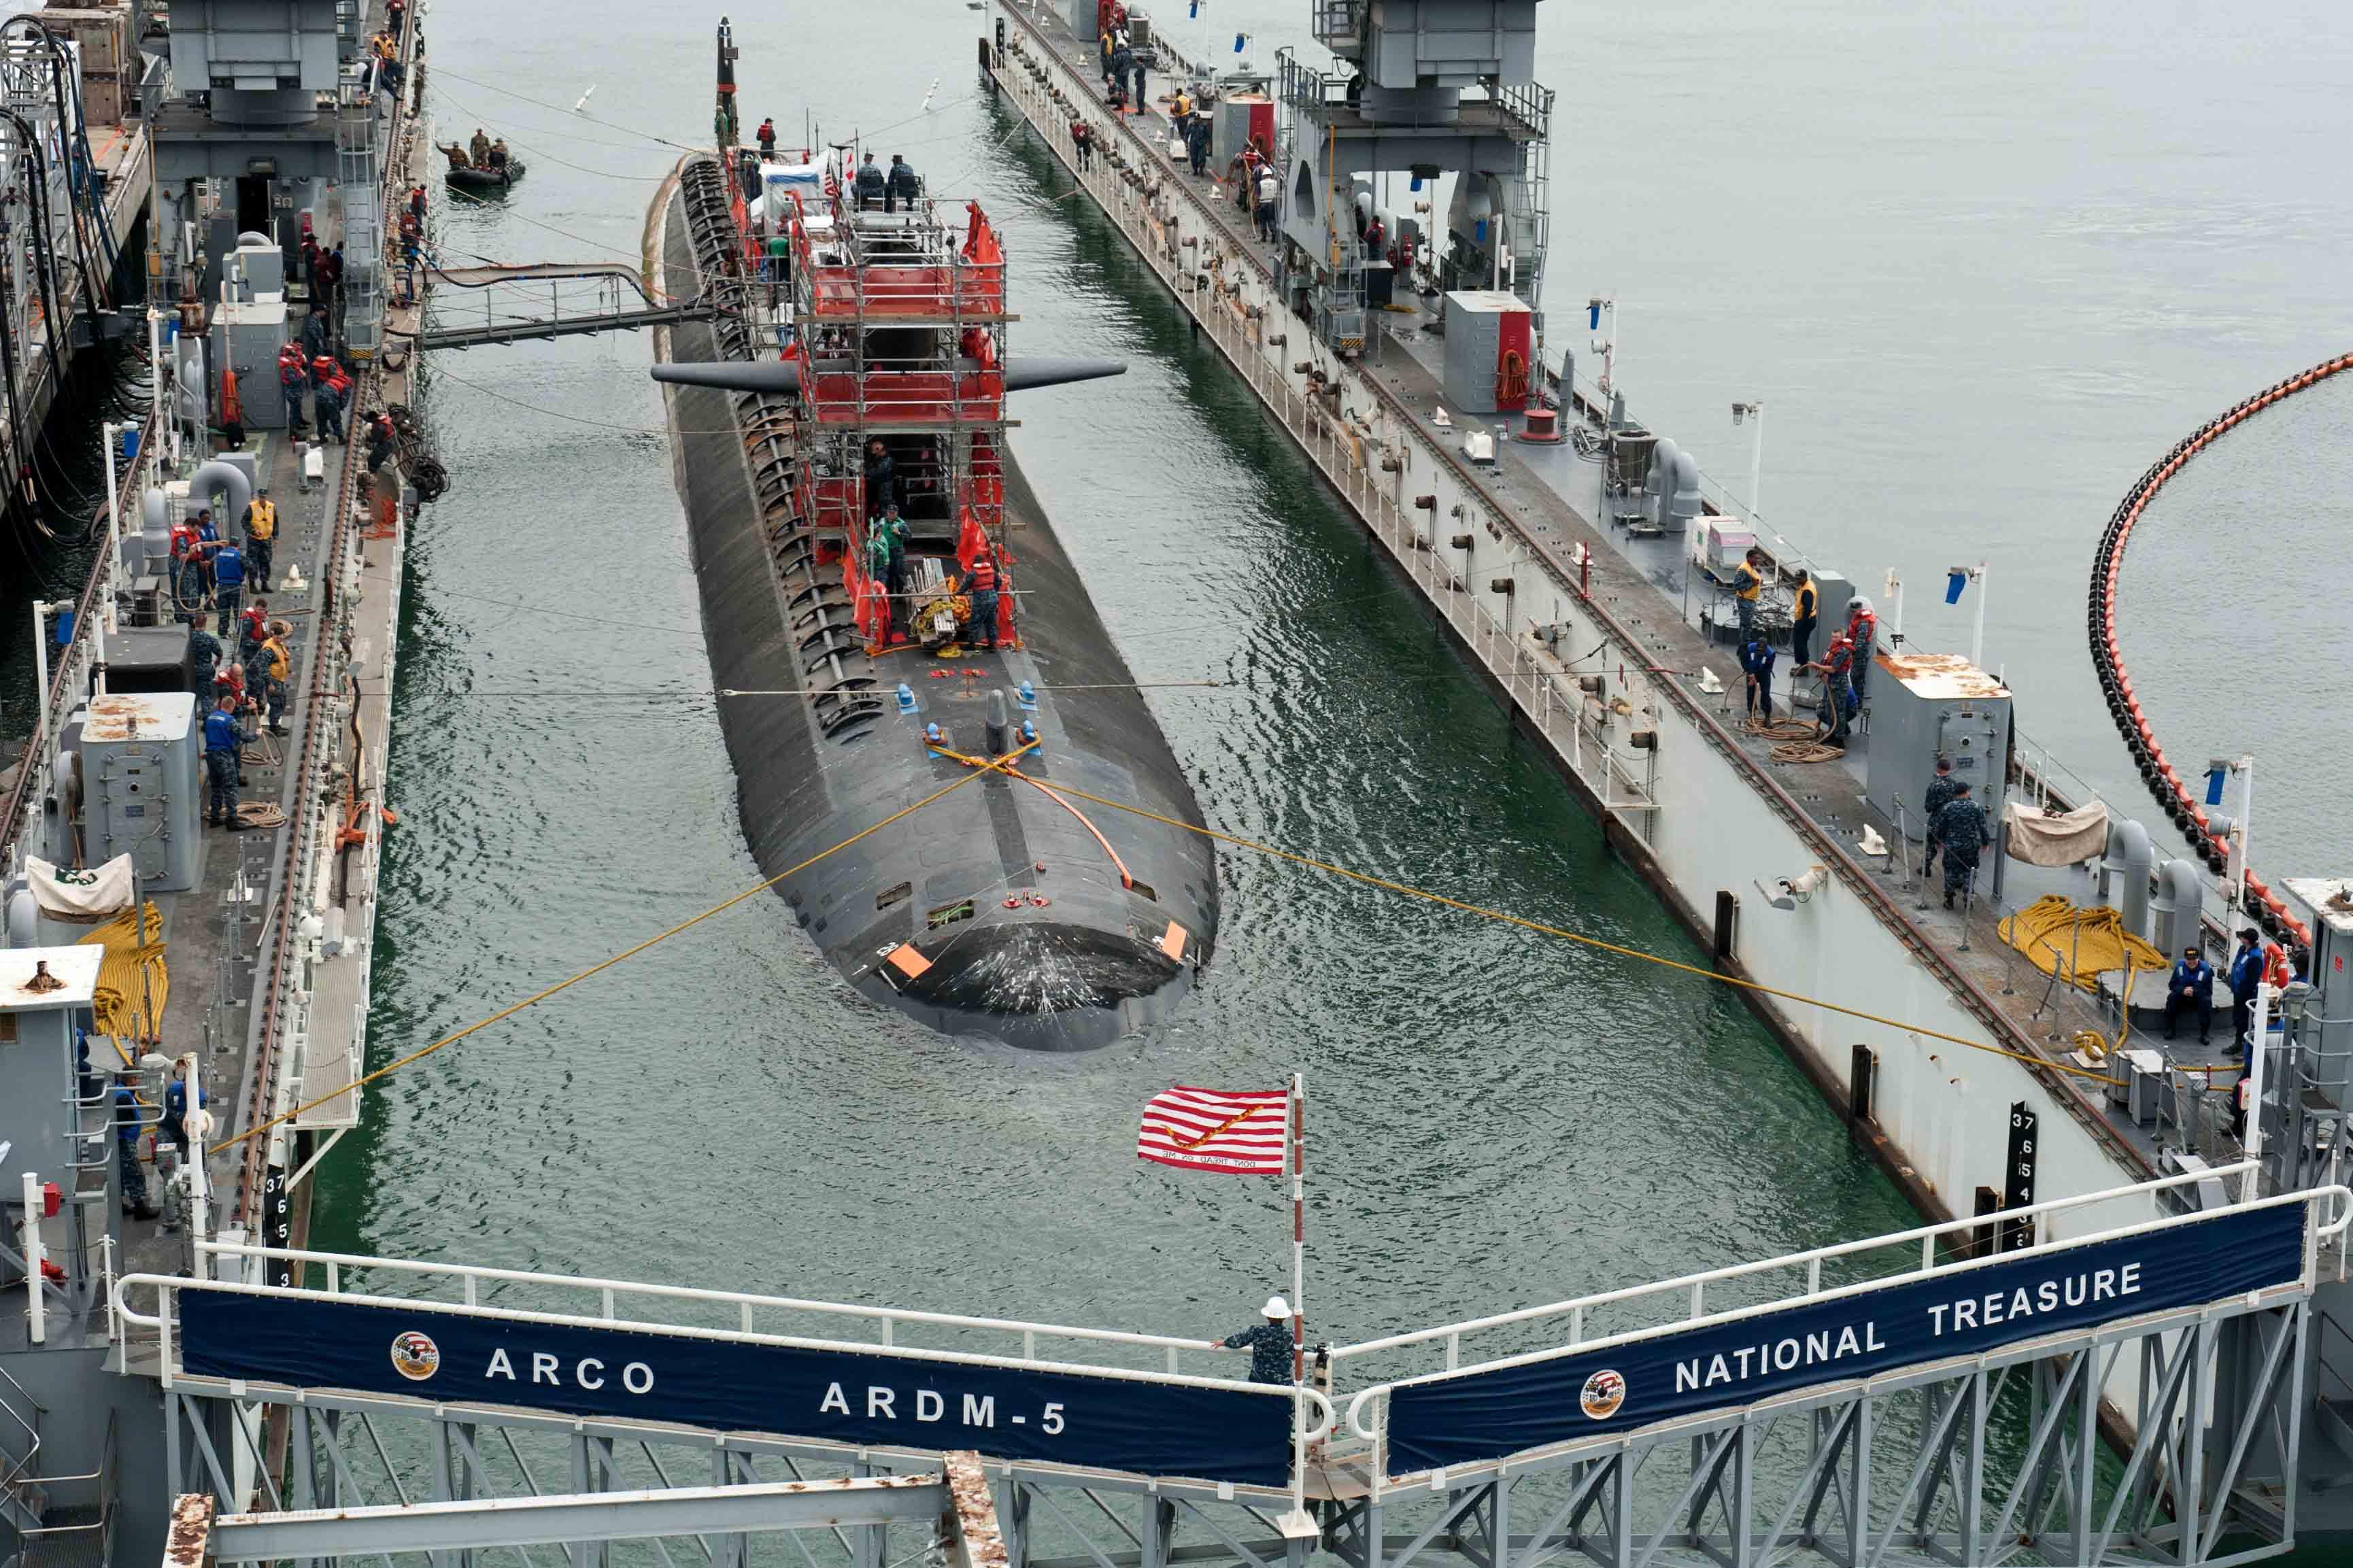 USS OKLAHOMA CITY SSN-723 am 05.05.2016 im Trockendock ARCO ARDM-5 Bild: U.S. Navy